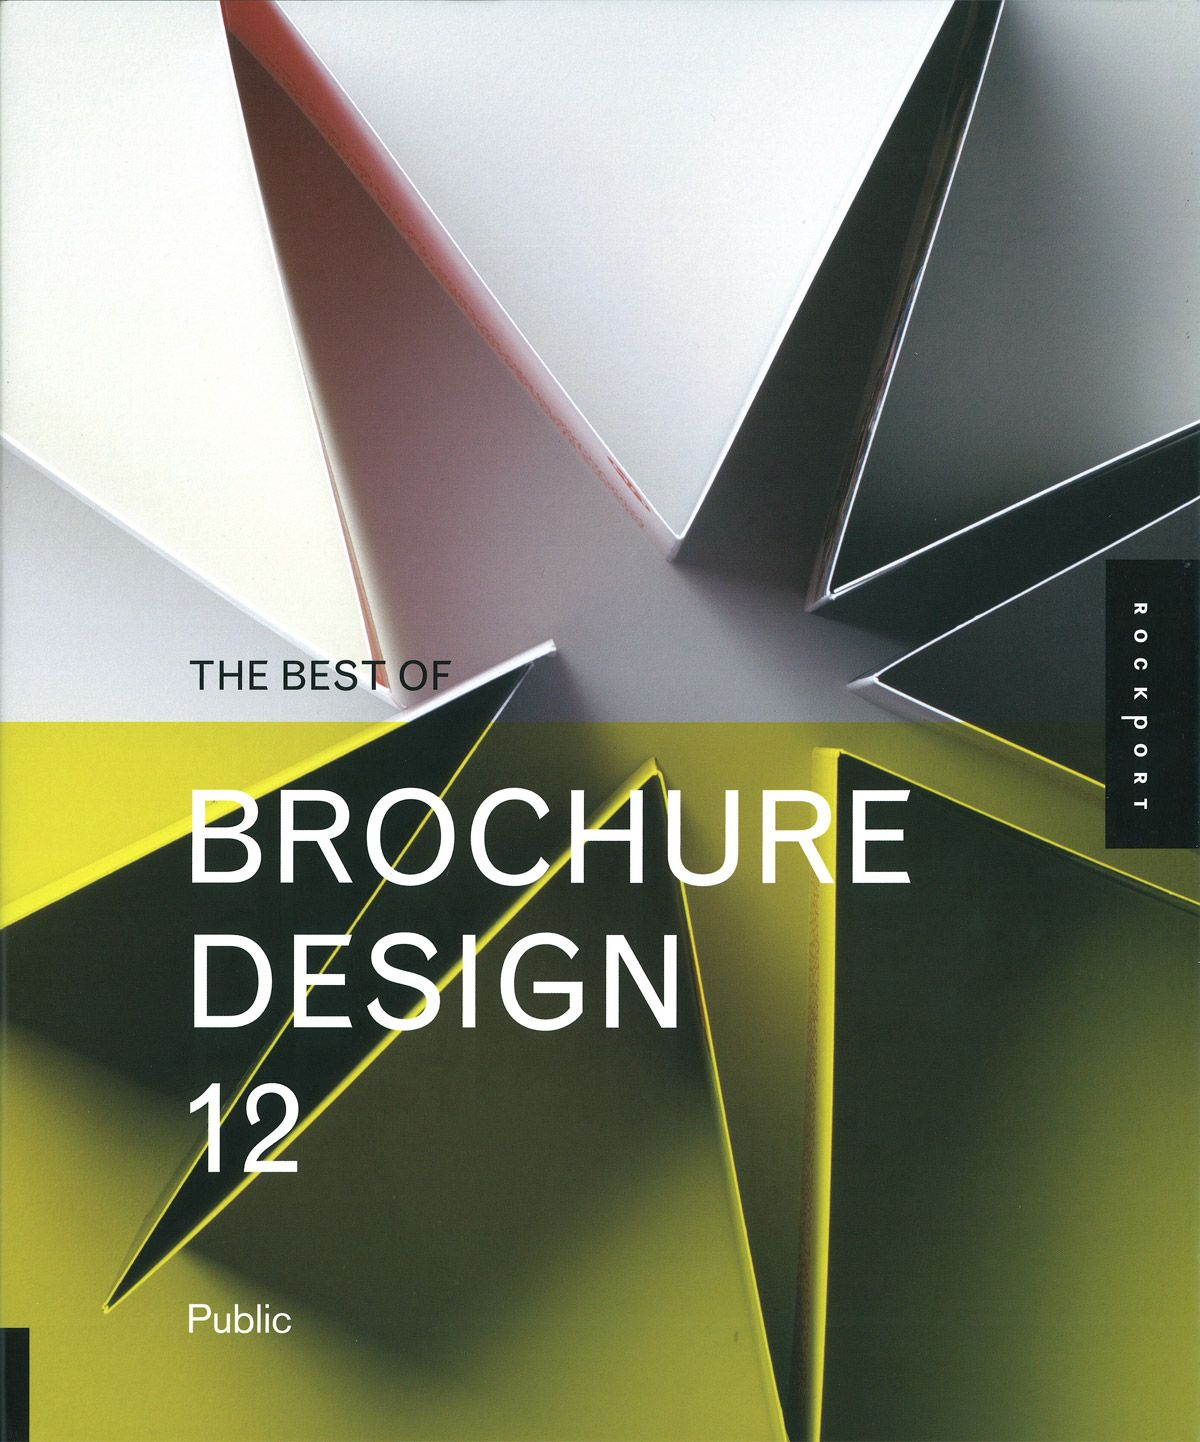 The Best of Brochure Design 12 bog fra Viking og Creas